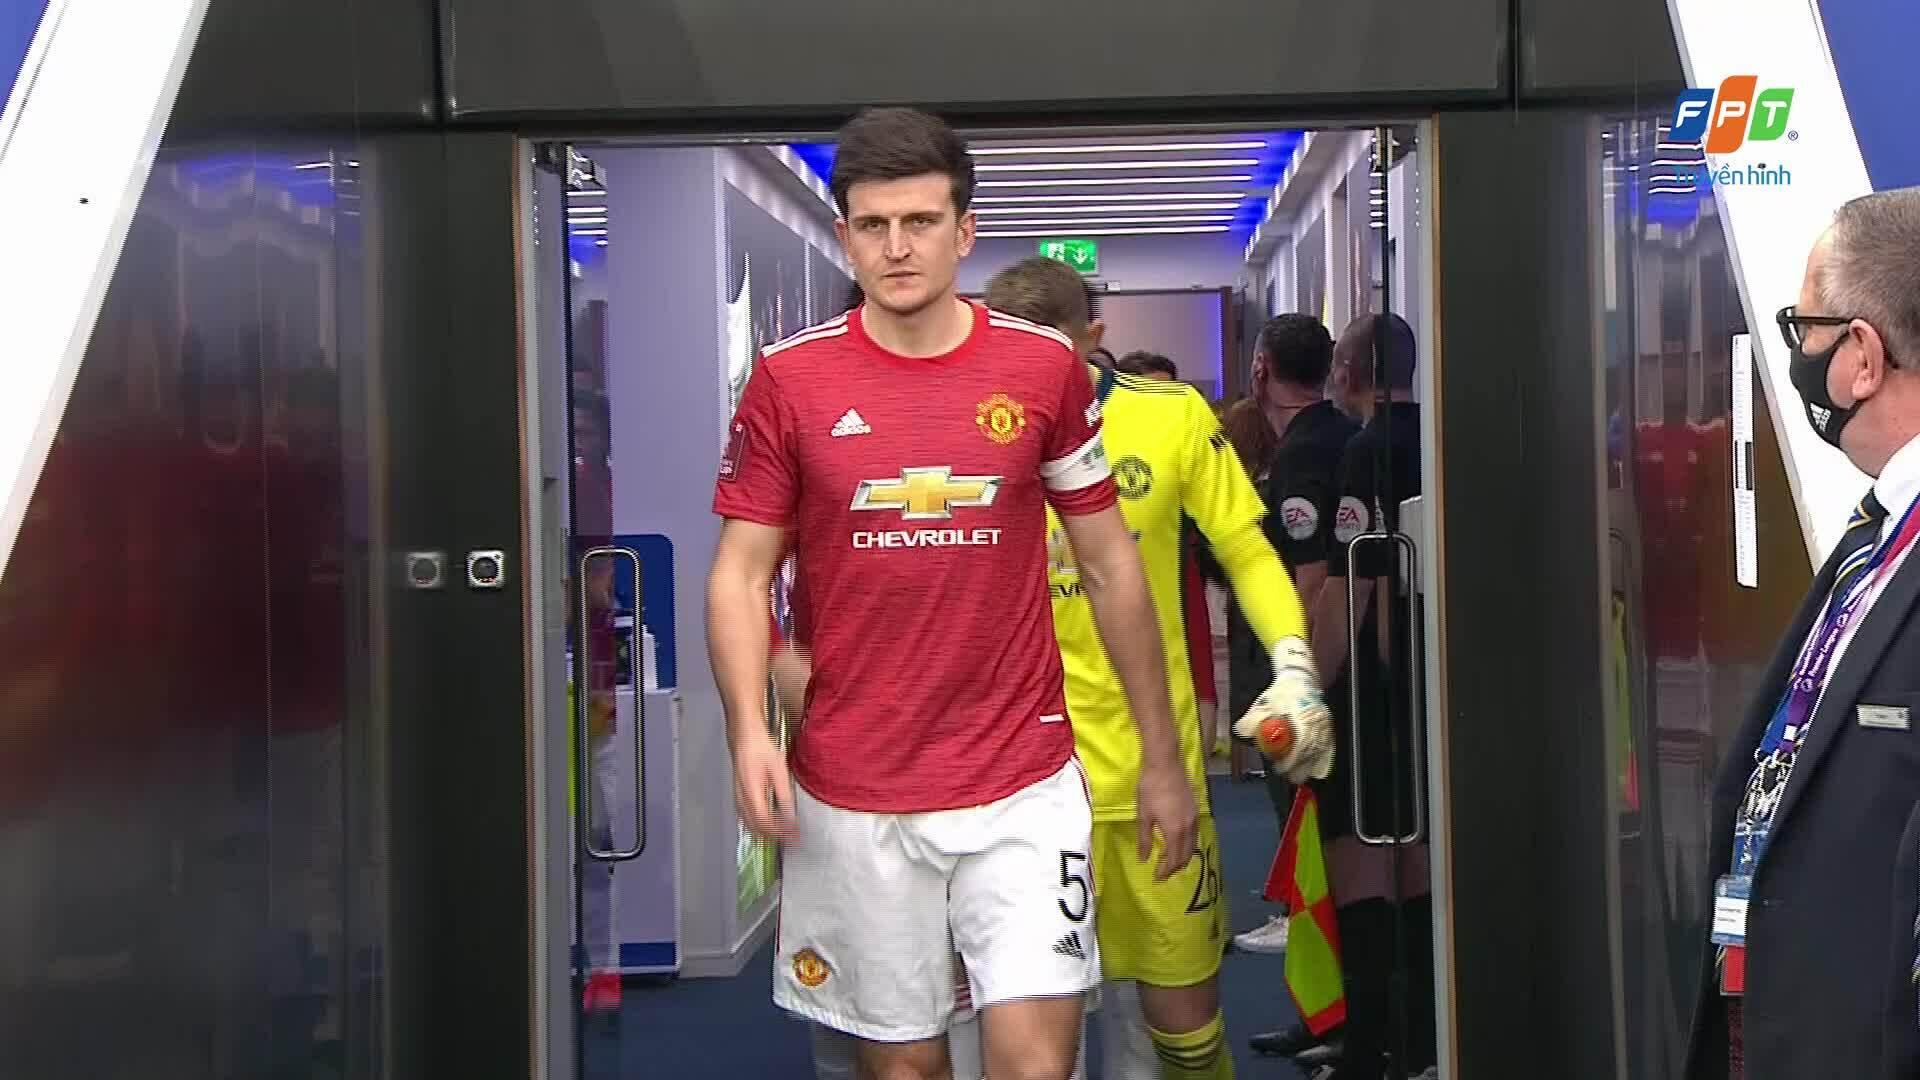 Leicester 3-1 Man Utd